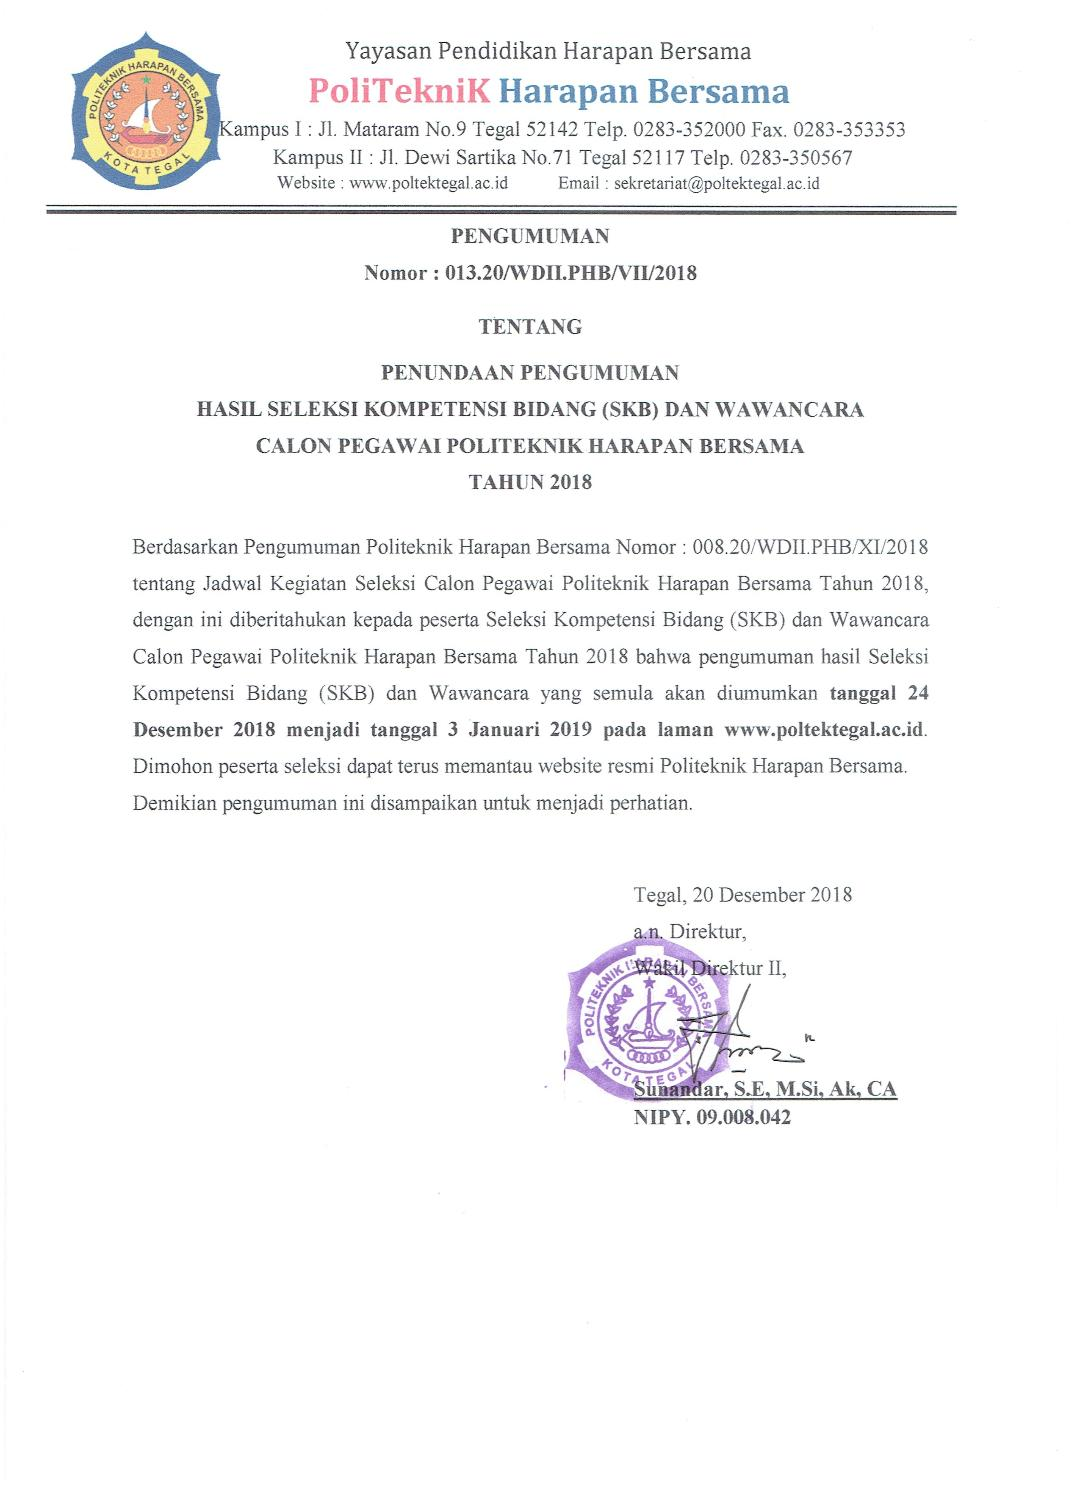 Penundaan Pengumuman Hasil SKB dan Wawancara Seleksi Pegawai PHB 2018